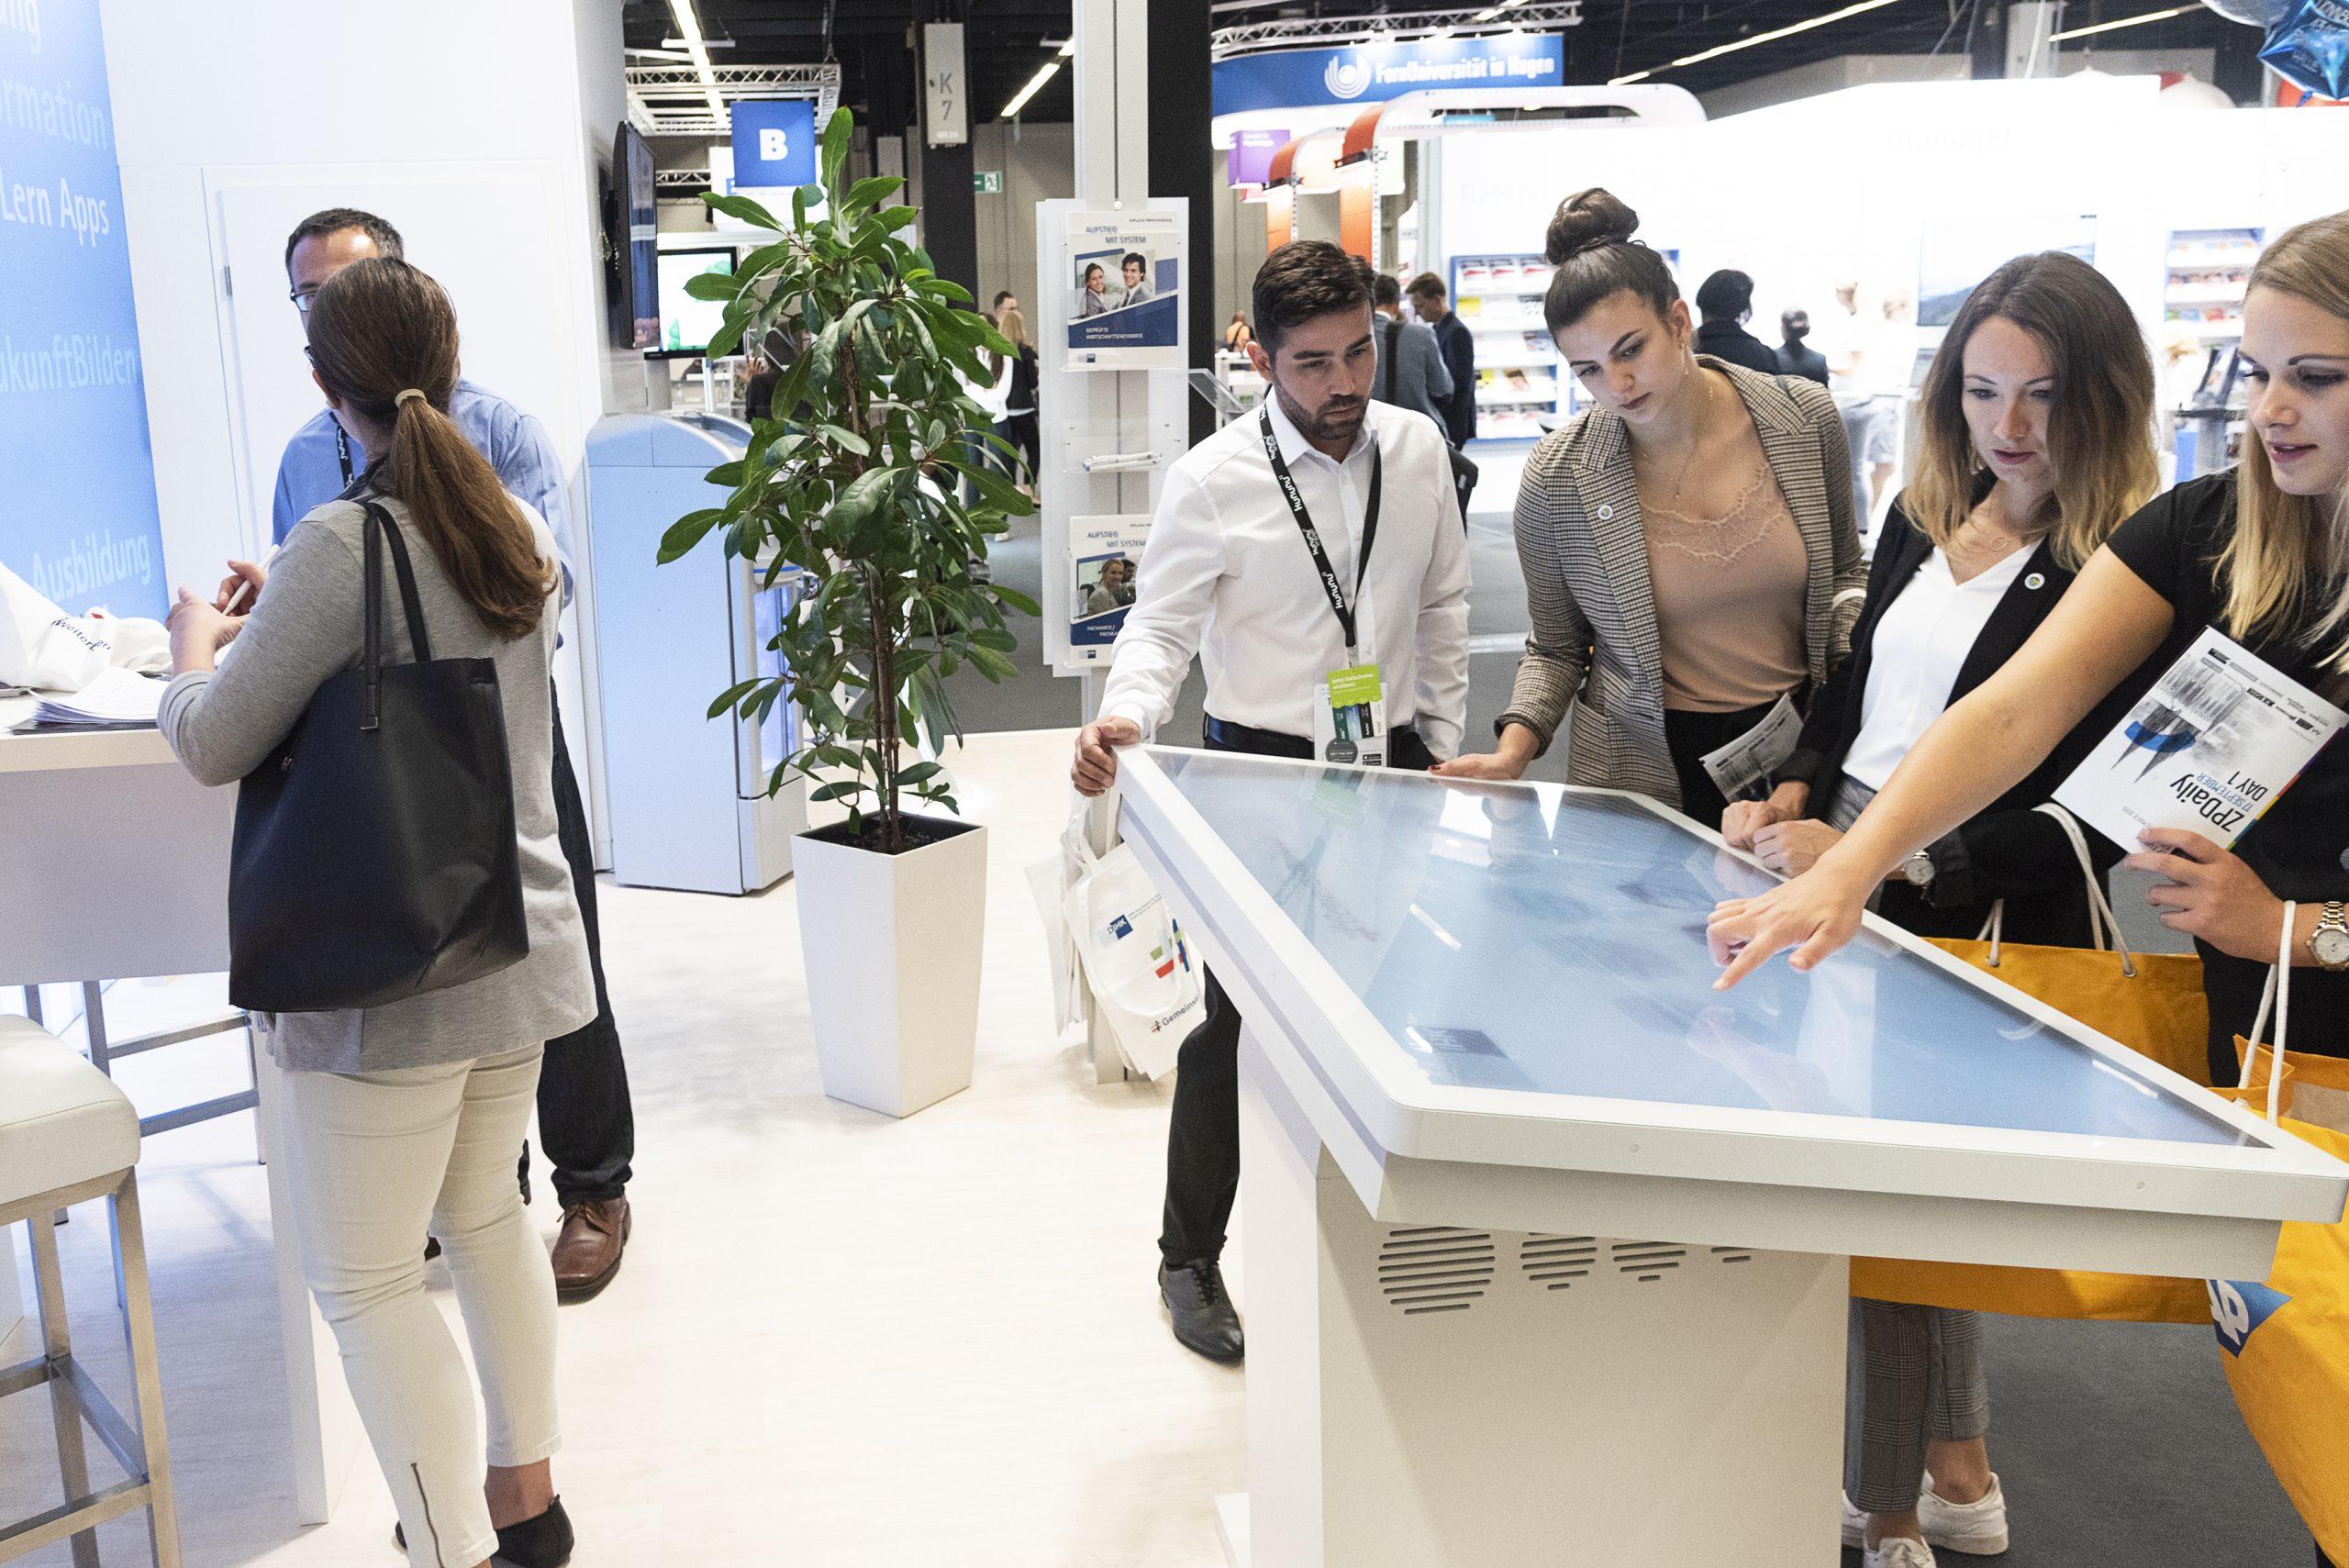 DIHK - staff future tradeshow